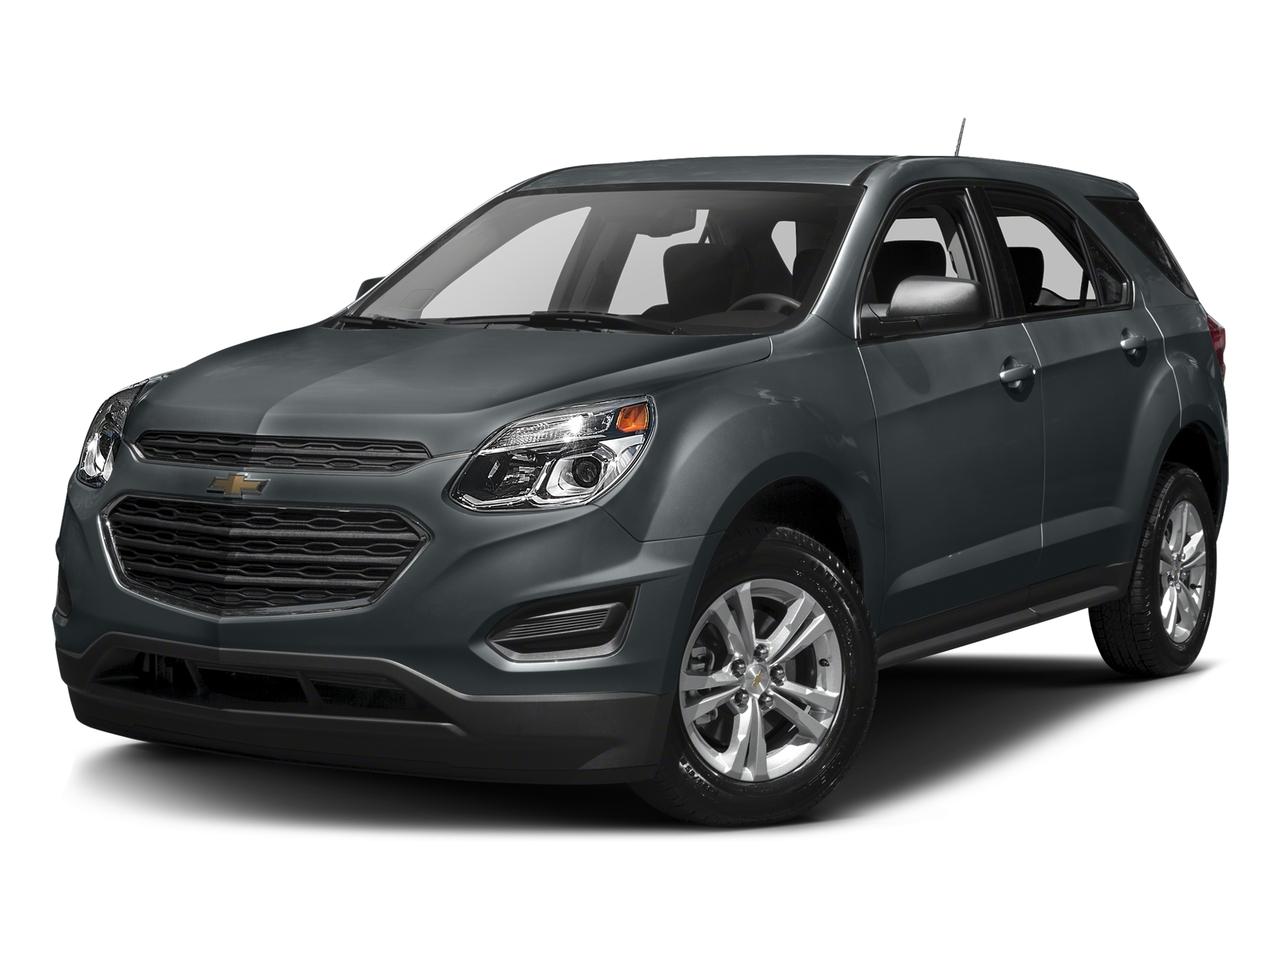 Gray Metallic 2017 Chevrolet Equinox LS SUV Lexington NC